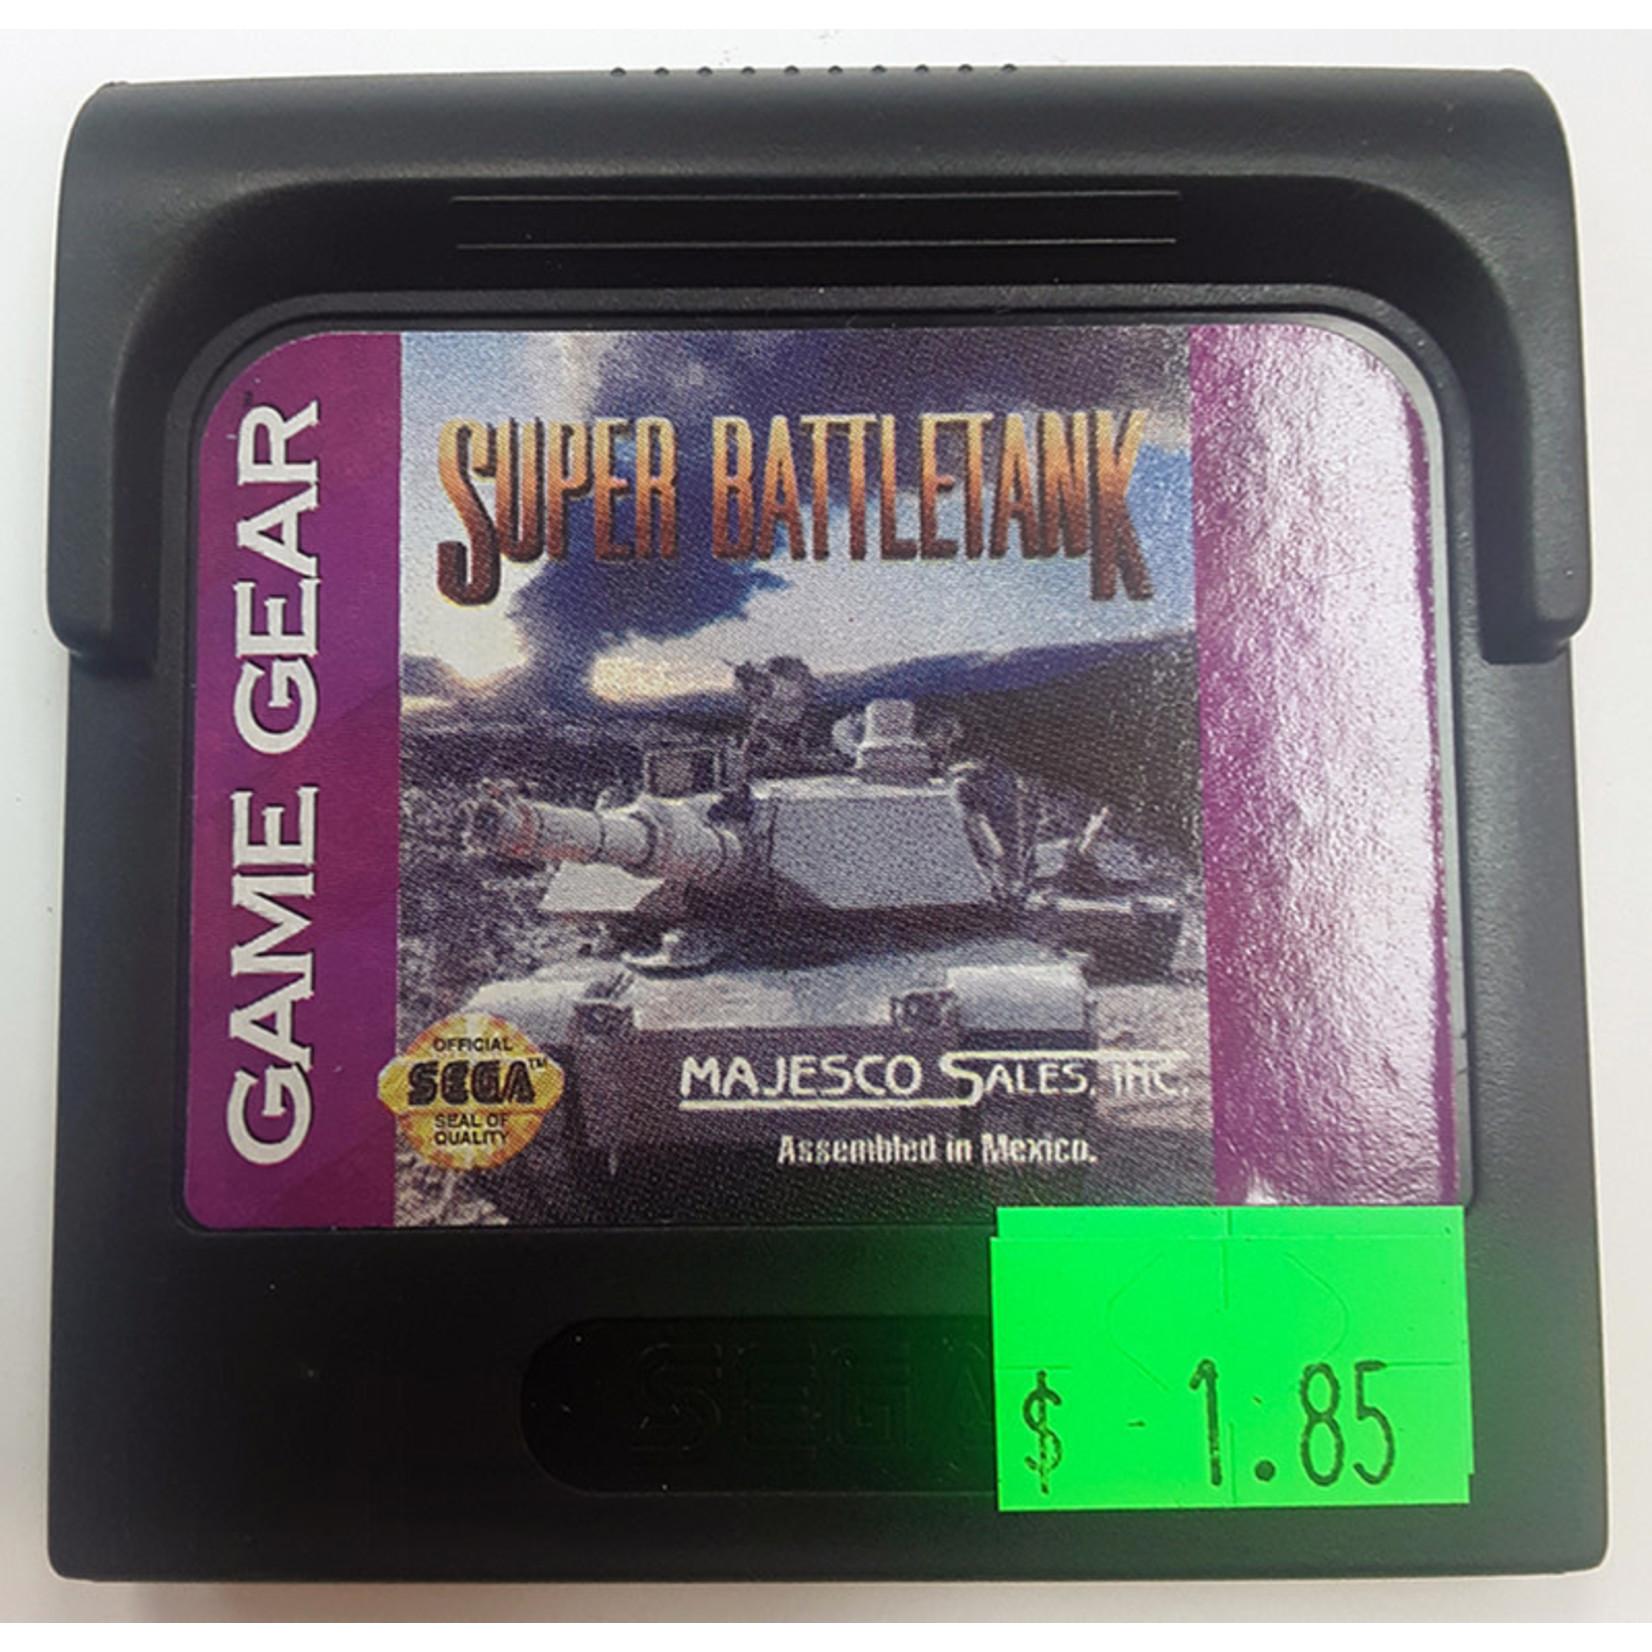 GGu-Super Battletank